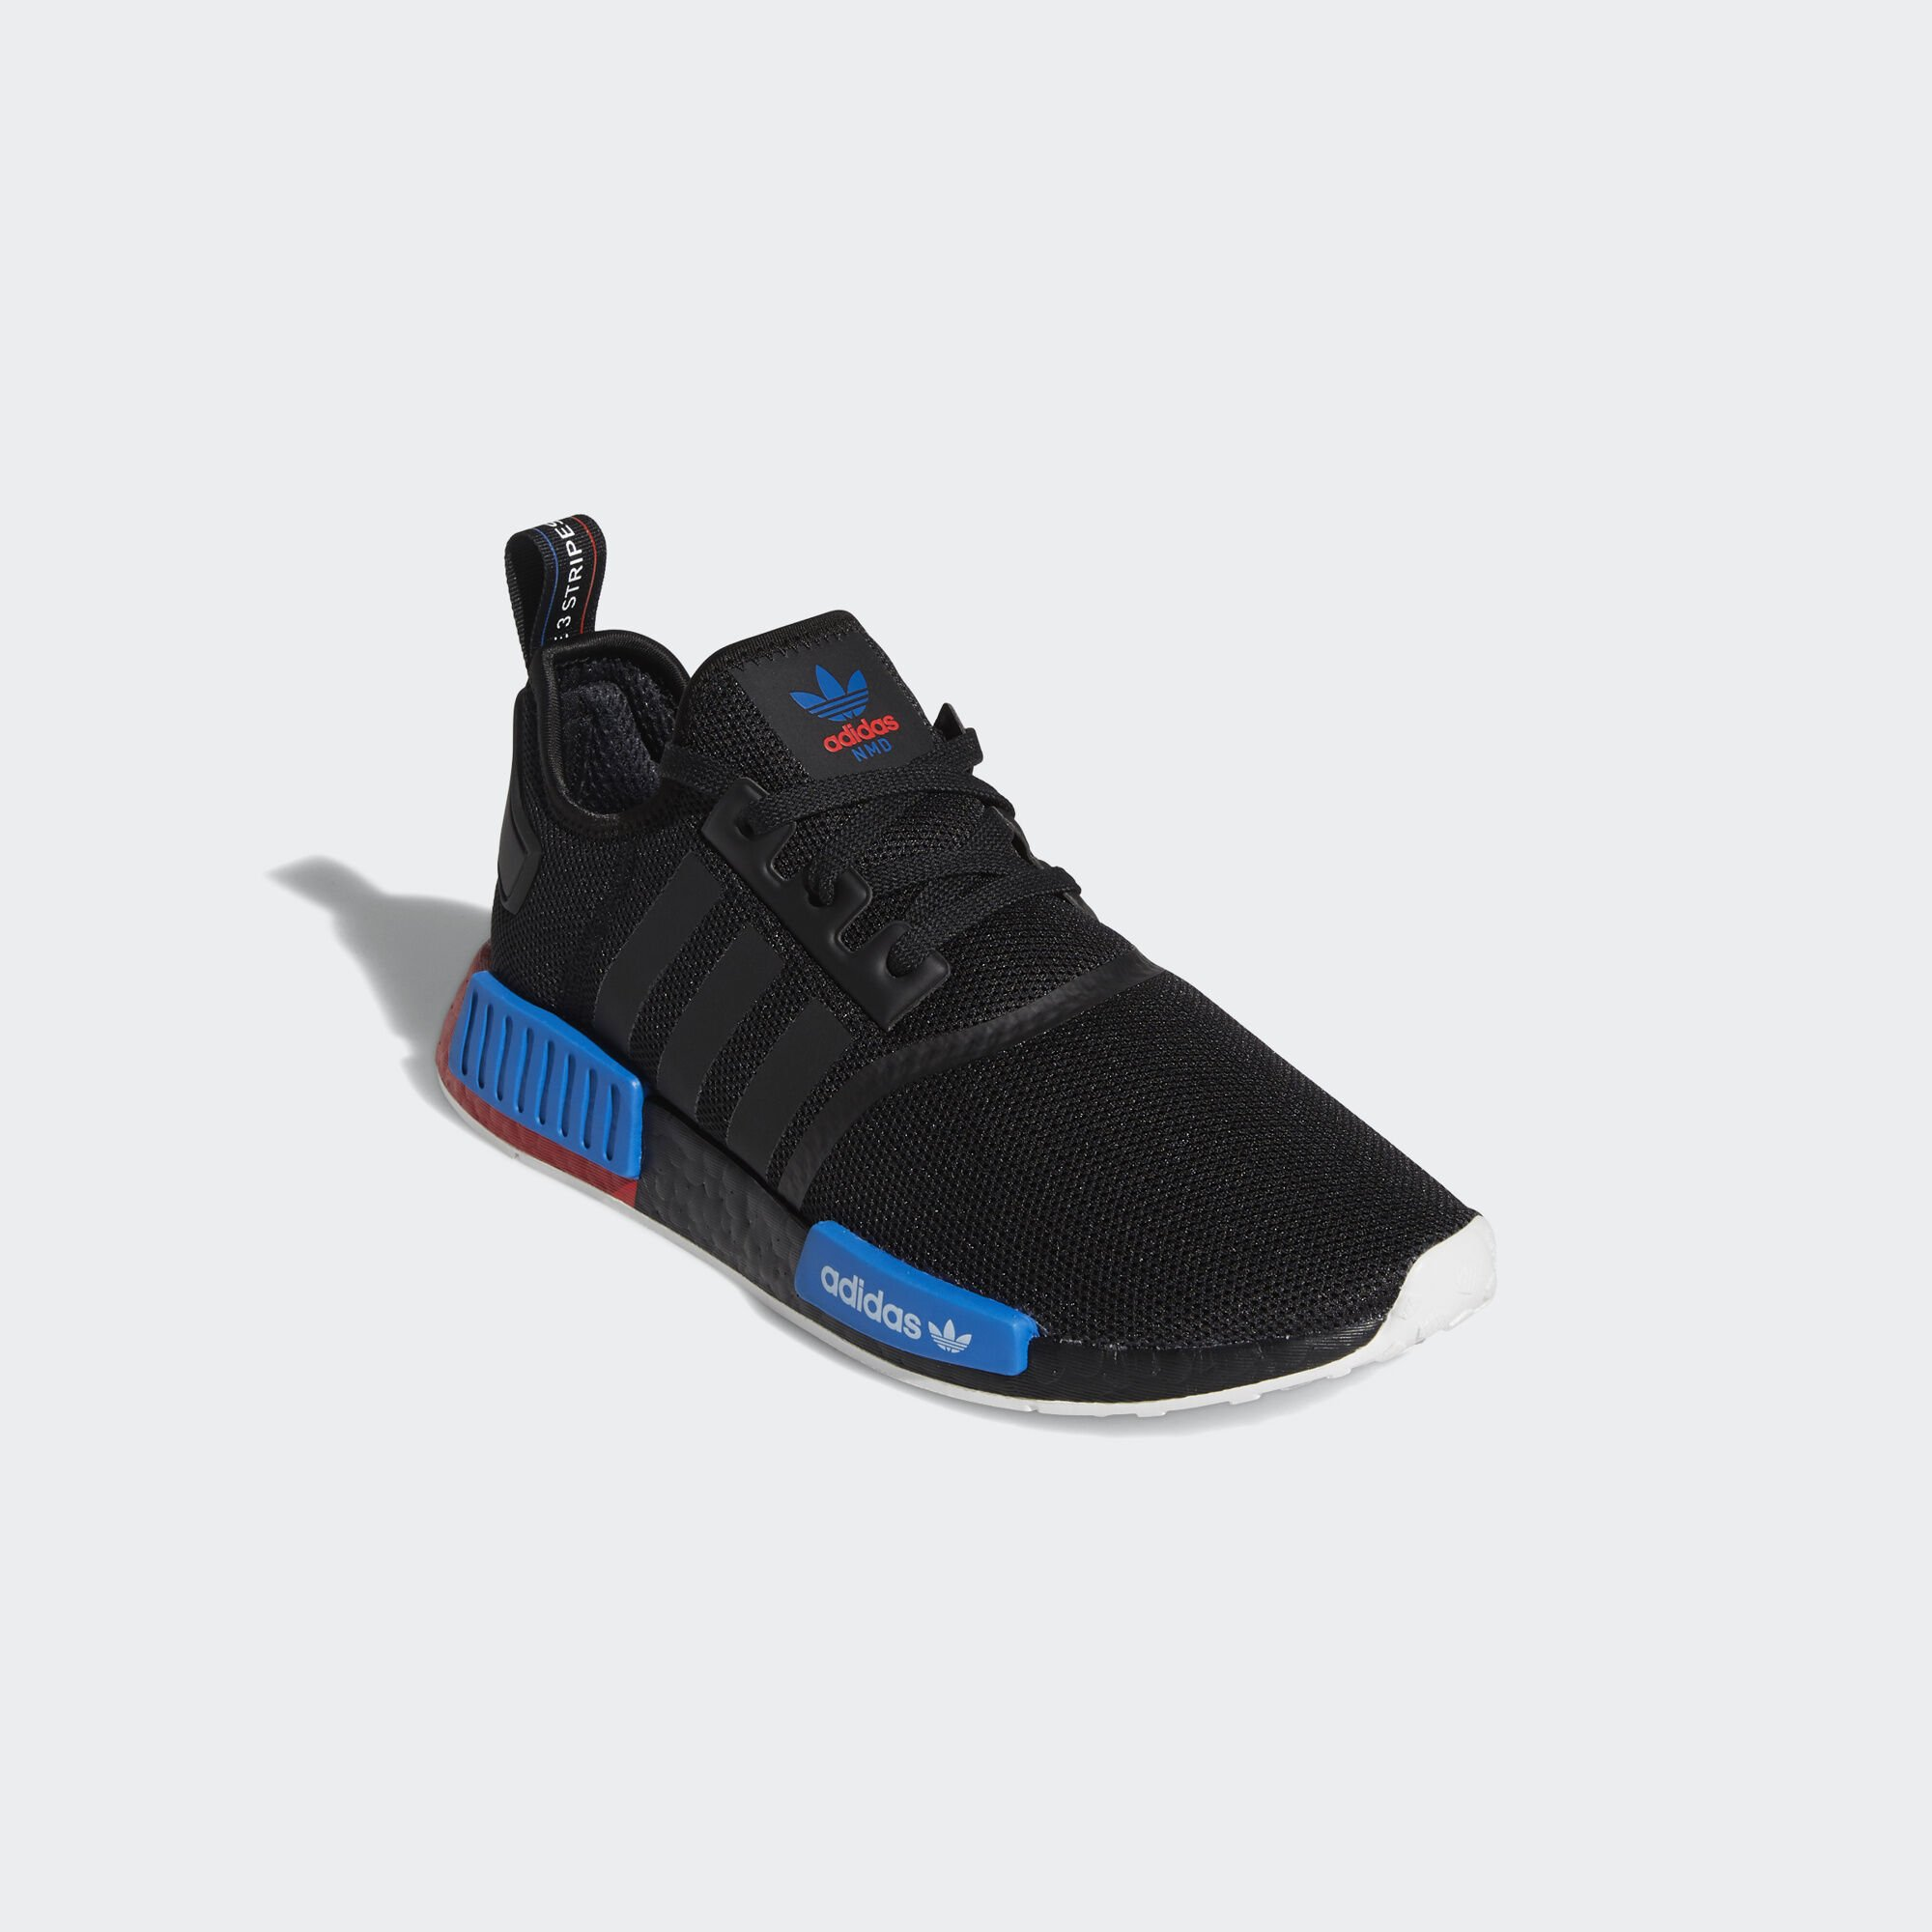 adidas NMD R1 Black Red Blue (FX4355)